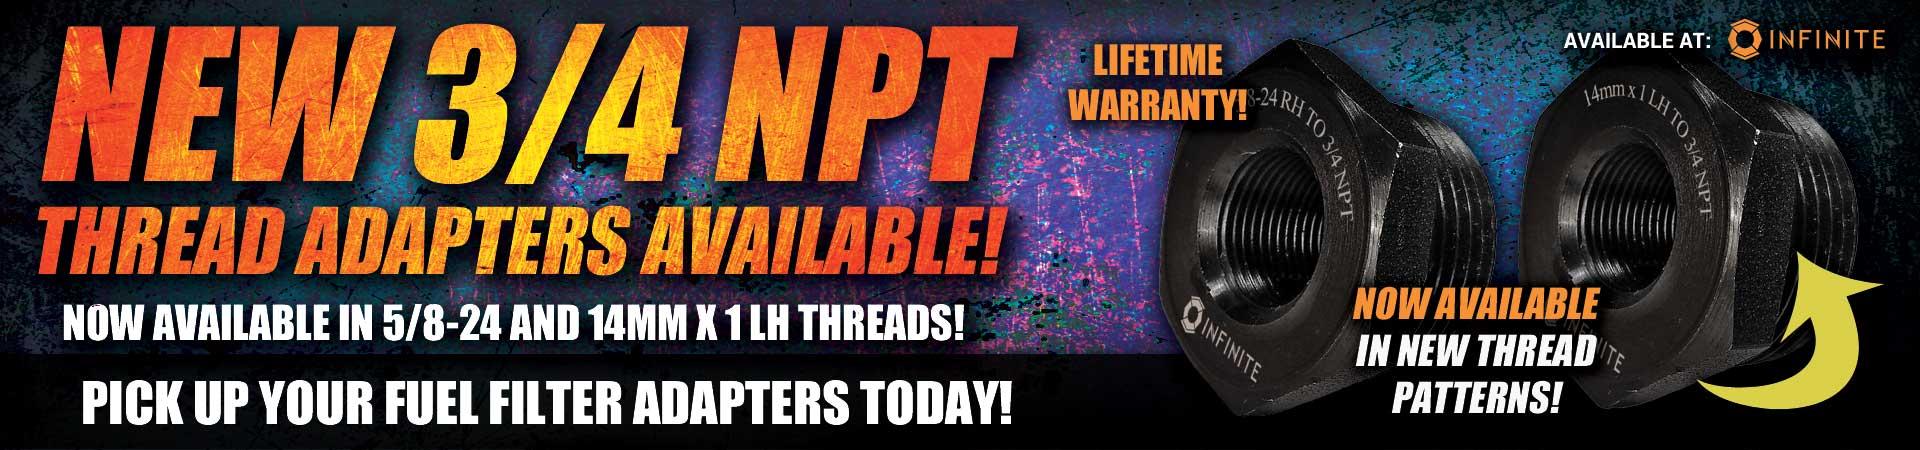 New NPT adapters!